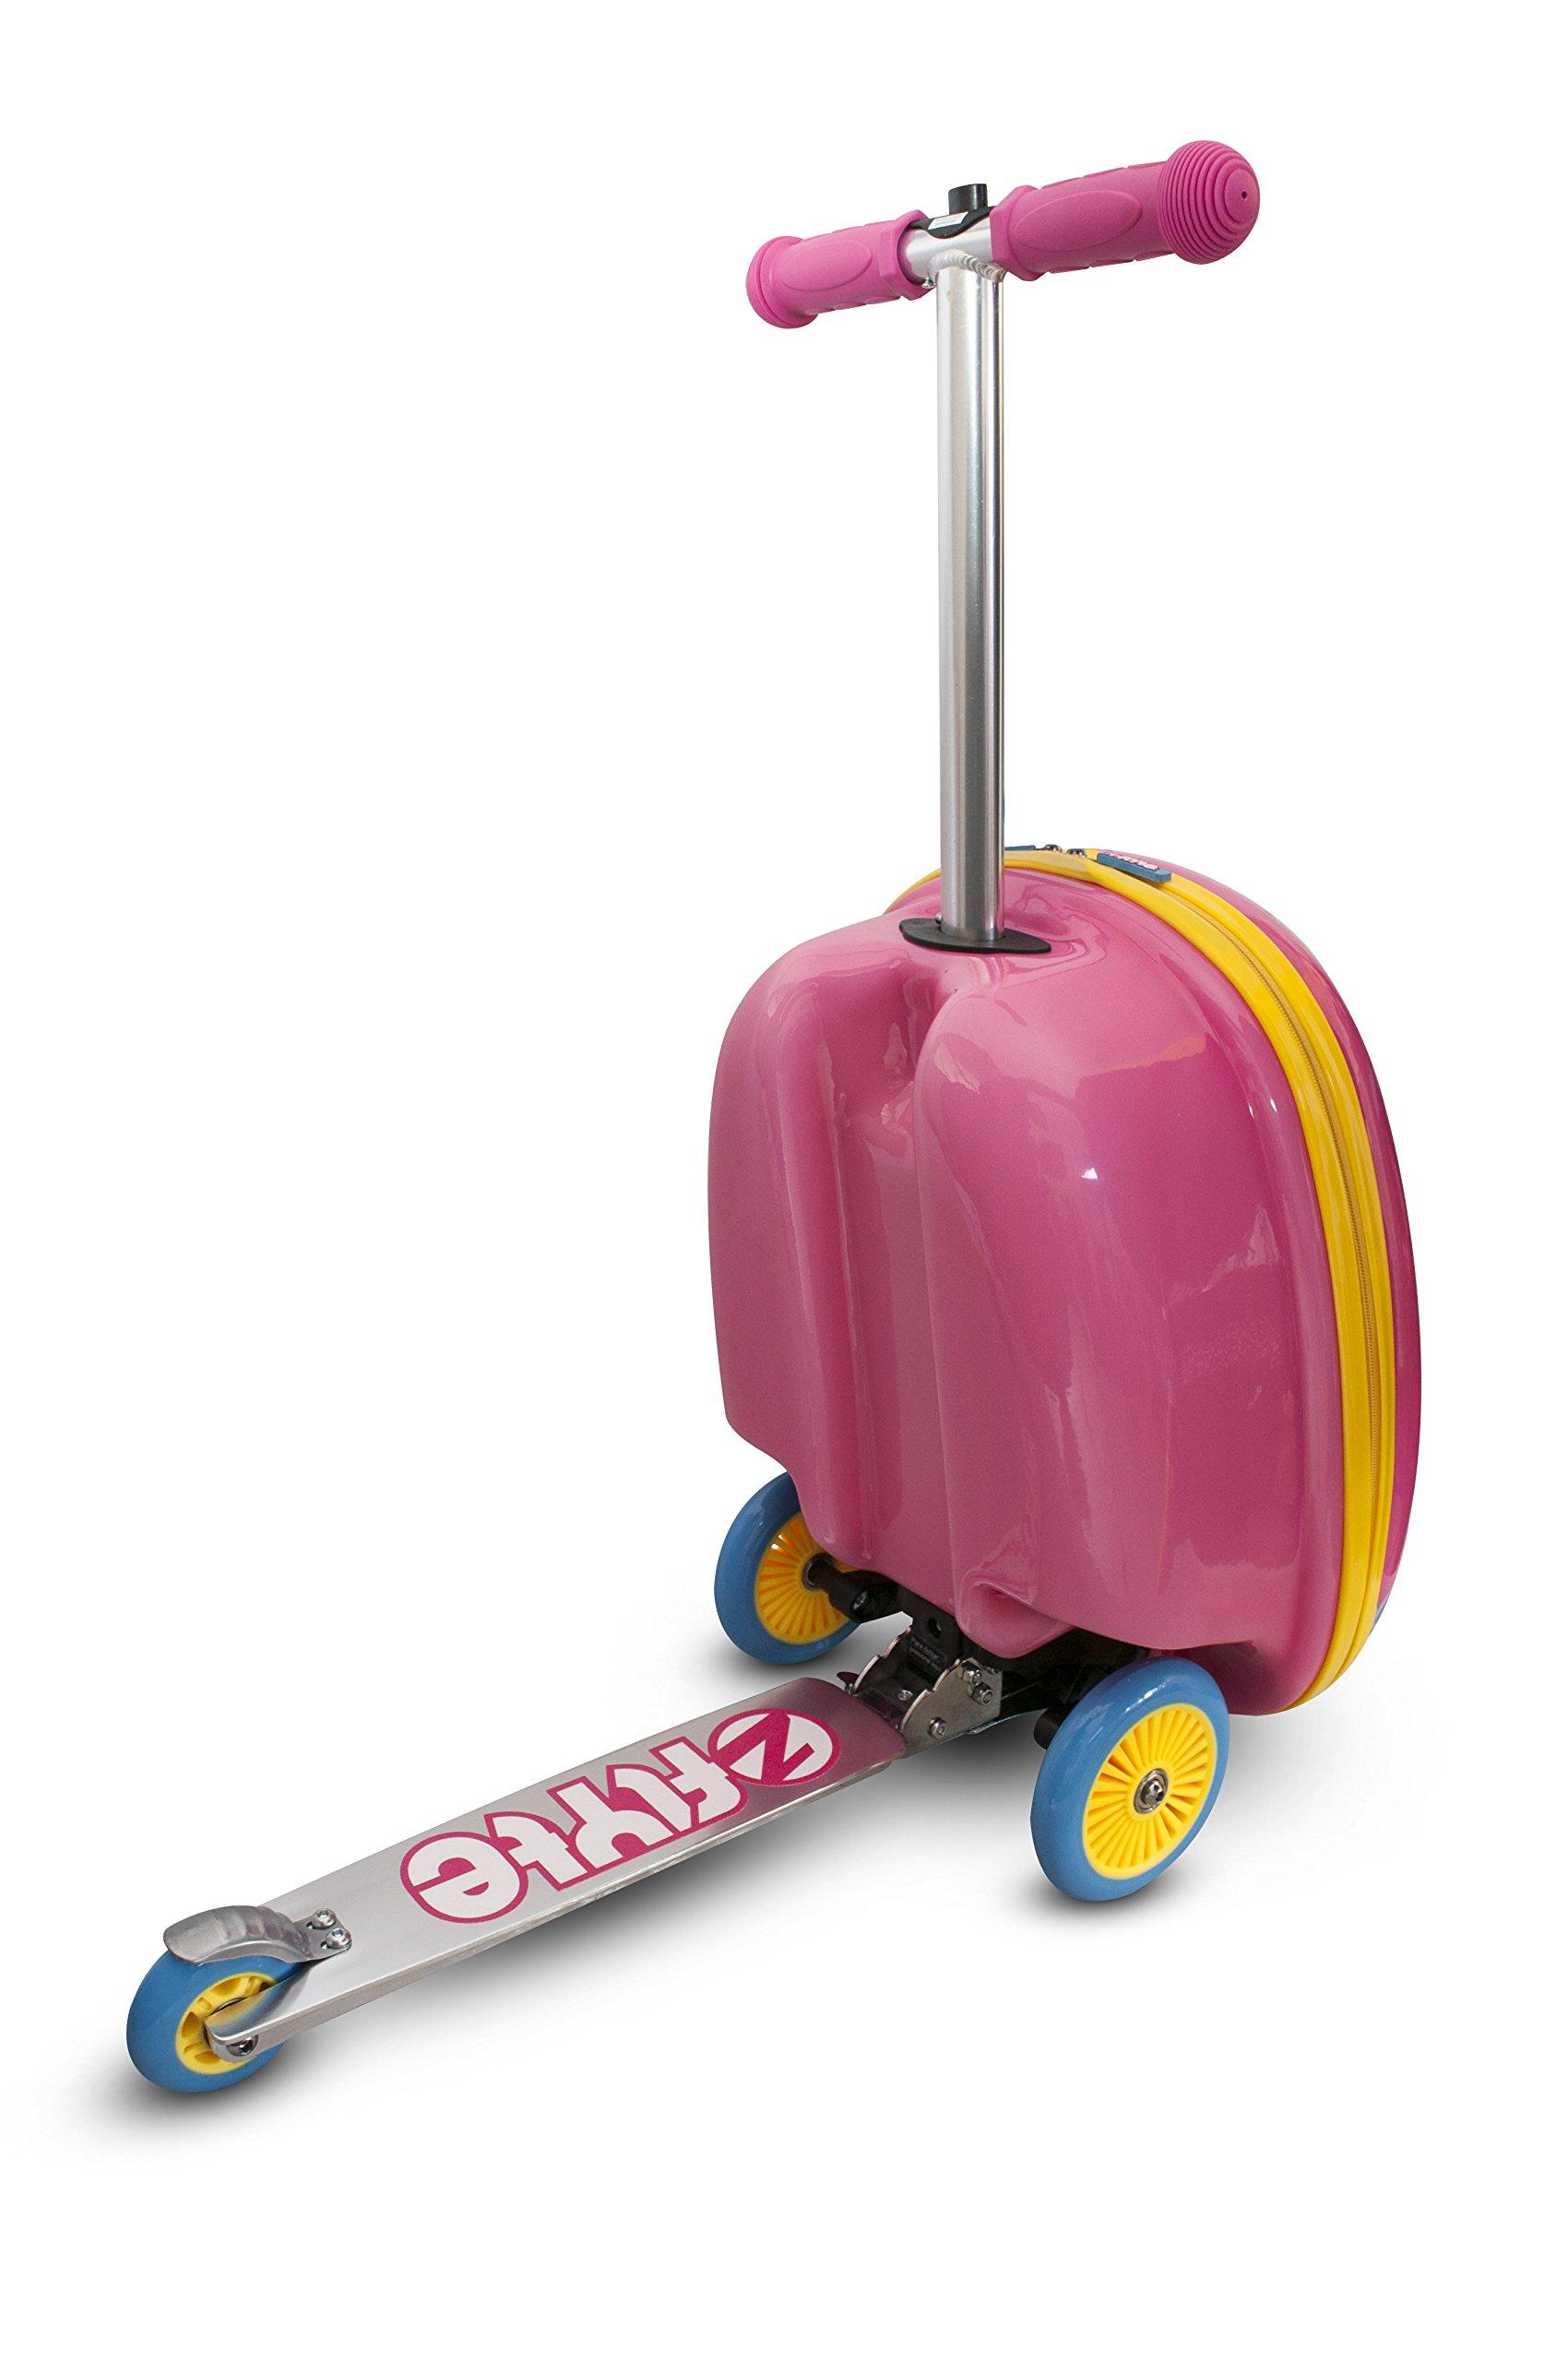 Zinc-Flyte-Midi-Scooter-Kindergepck-rosa-rose-Carry-on